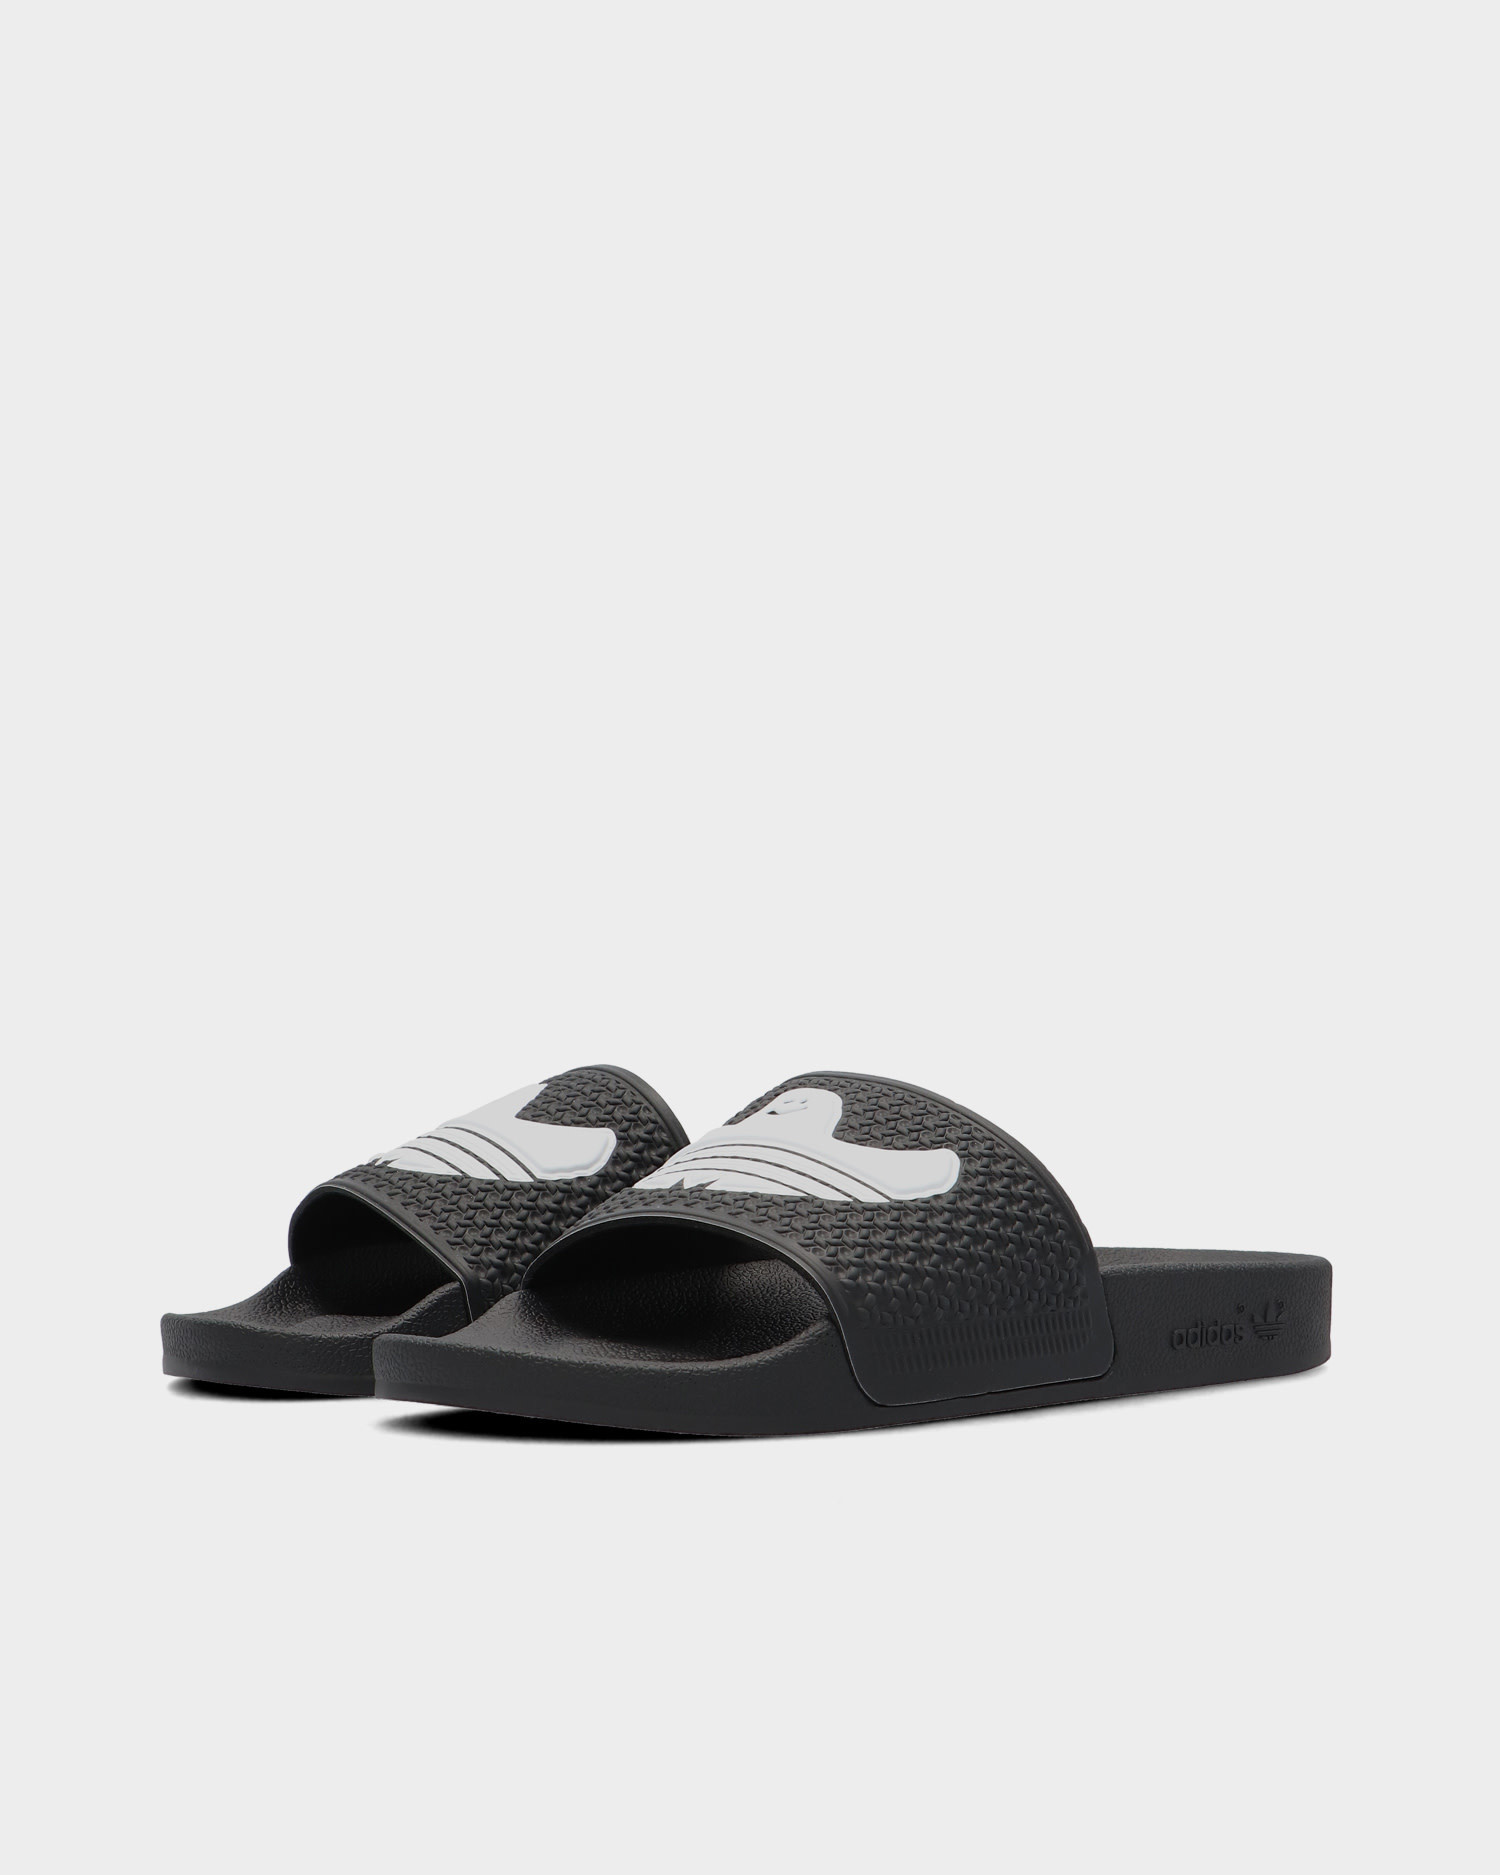 Adidas Shmoofoil Slide Cblack/Footwear White